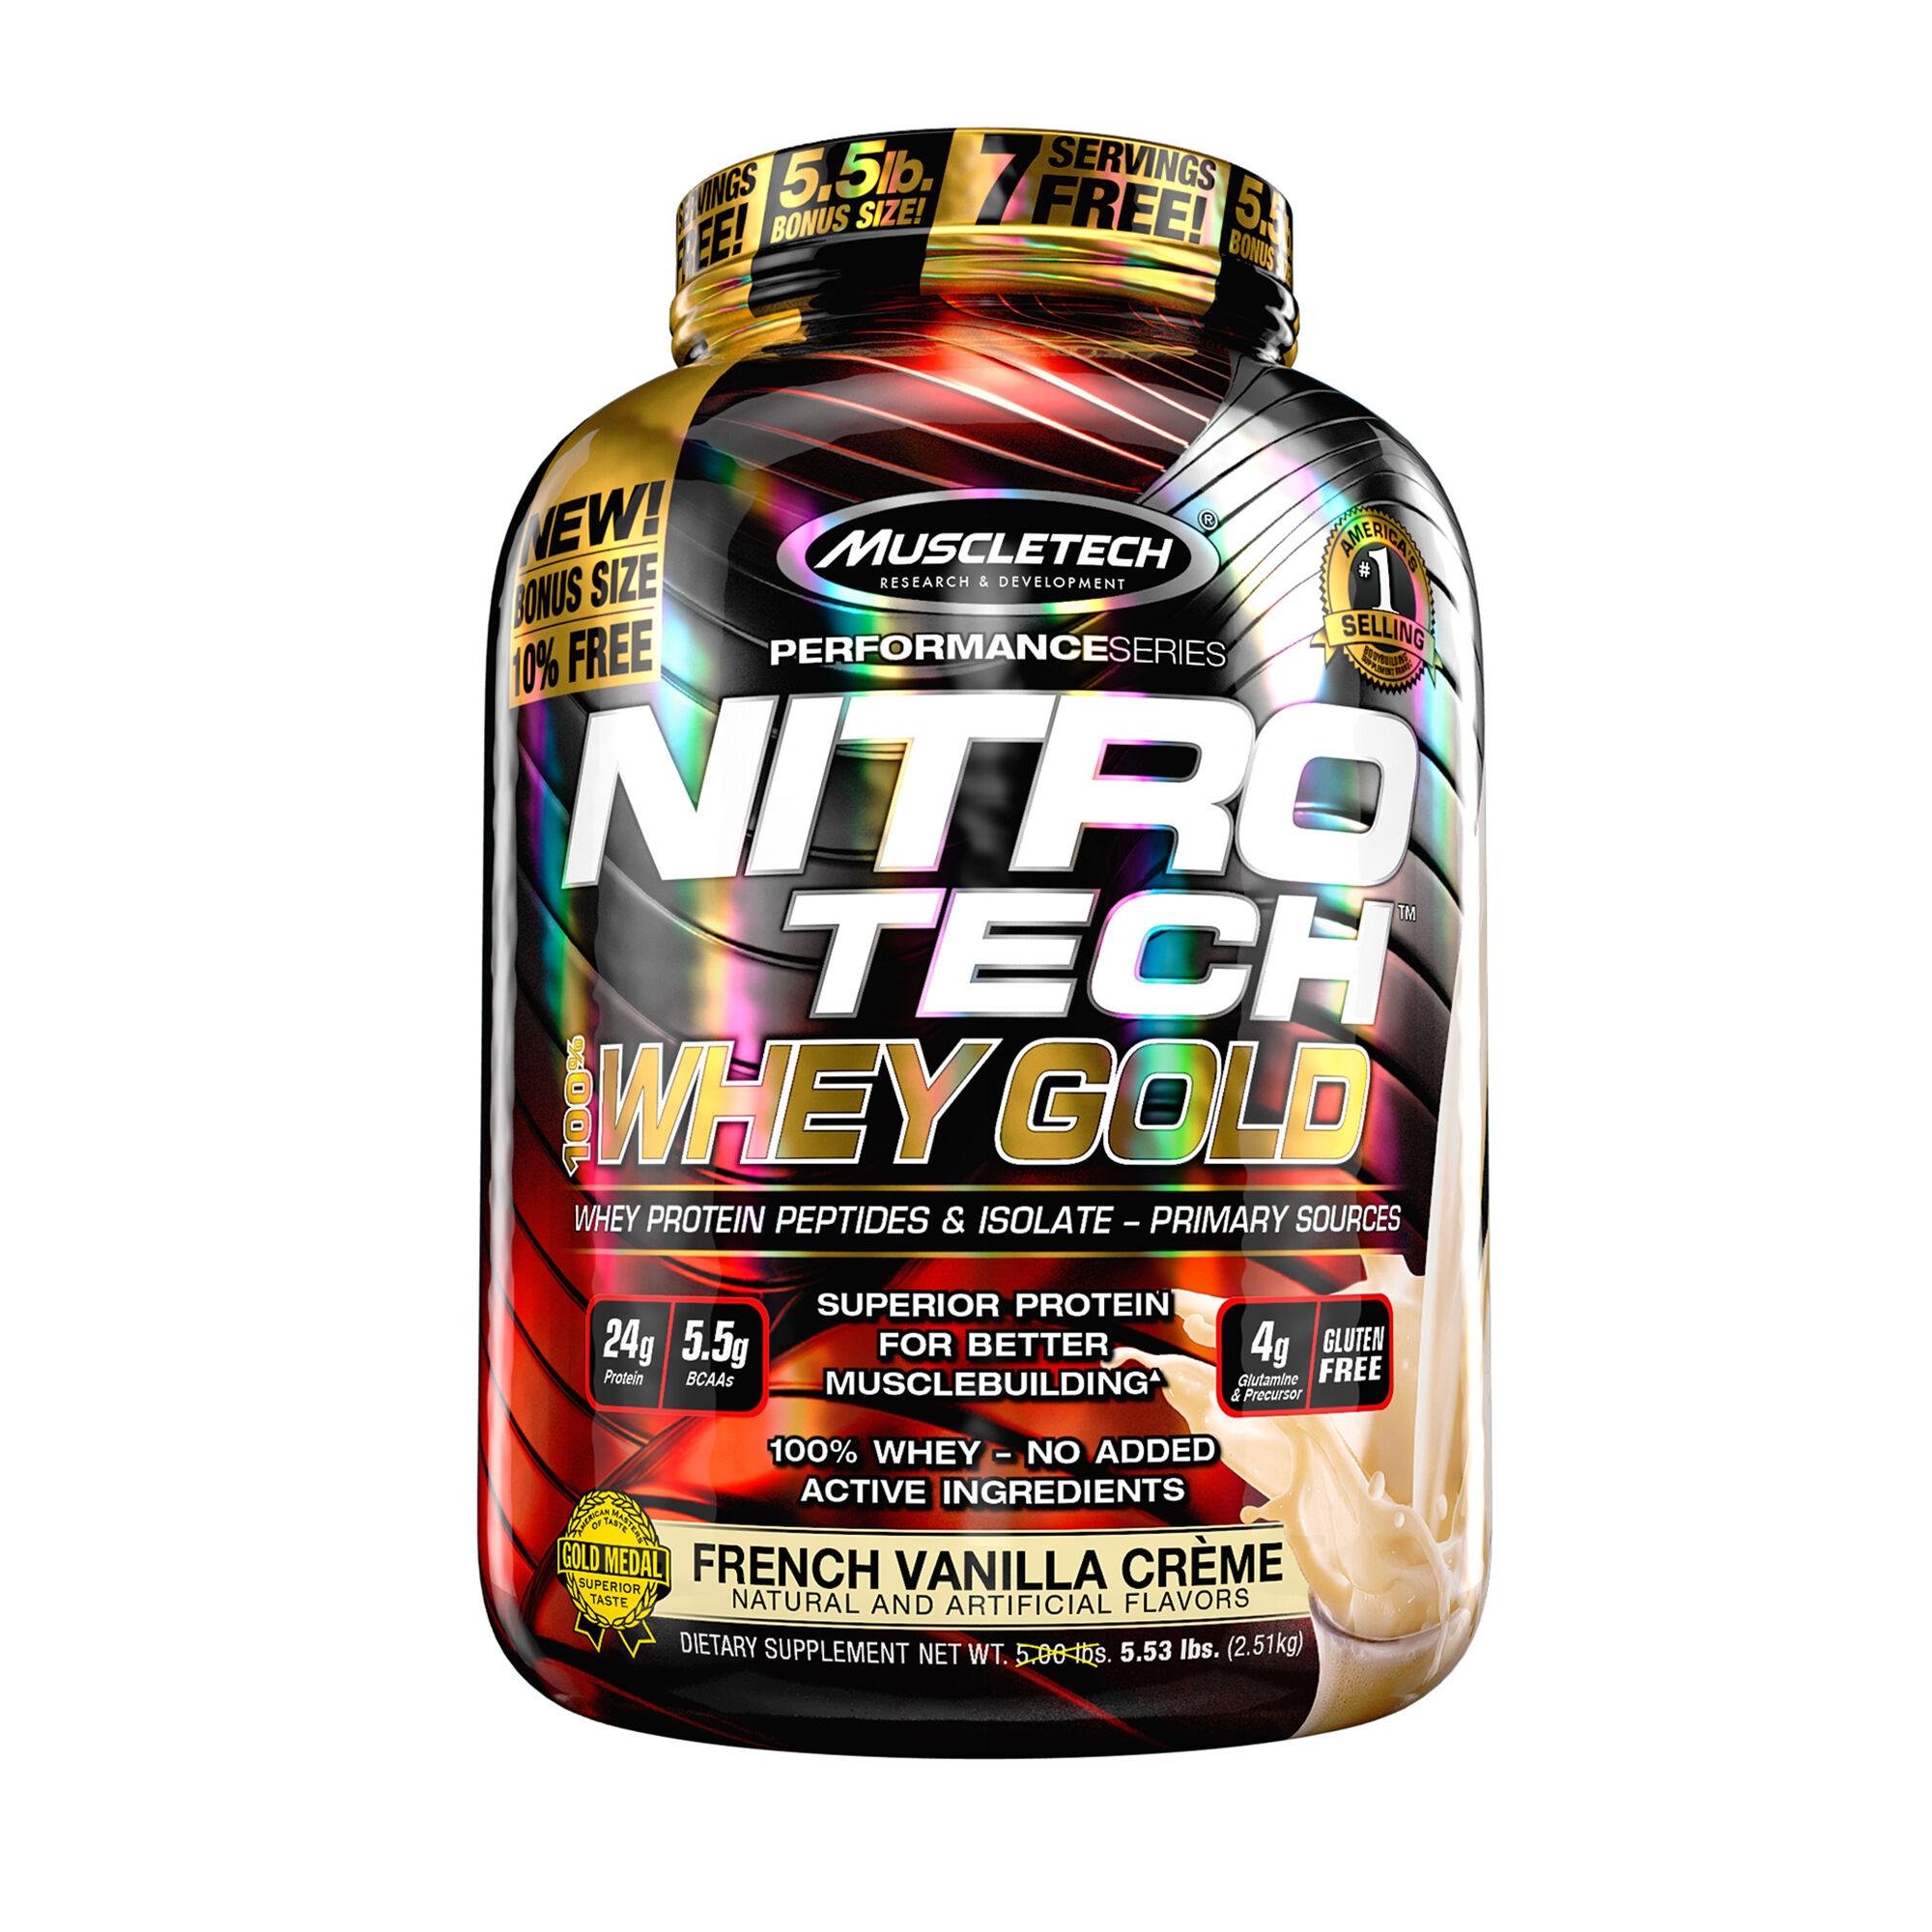 Muscletech Nitro Tech 100 Whey Gold French Vanilla Creme Gnc